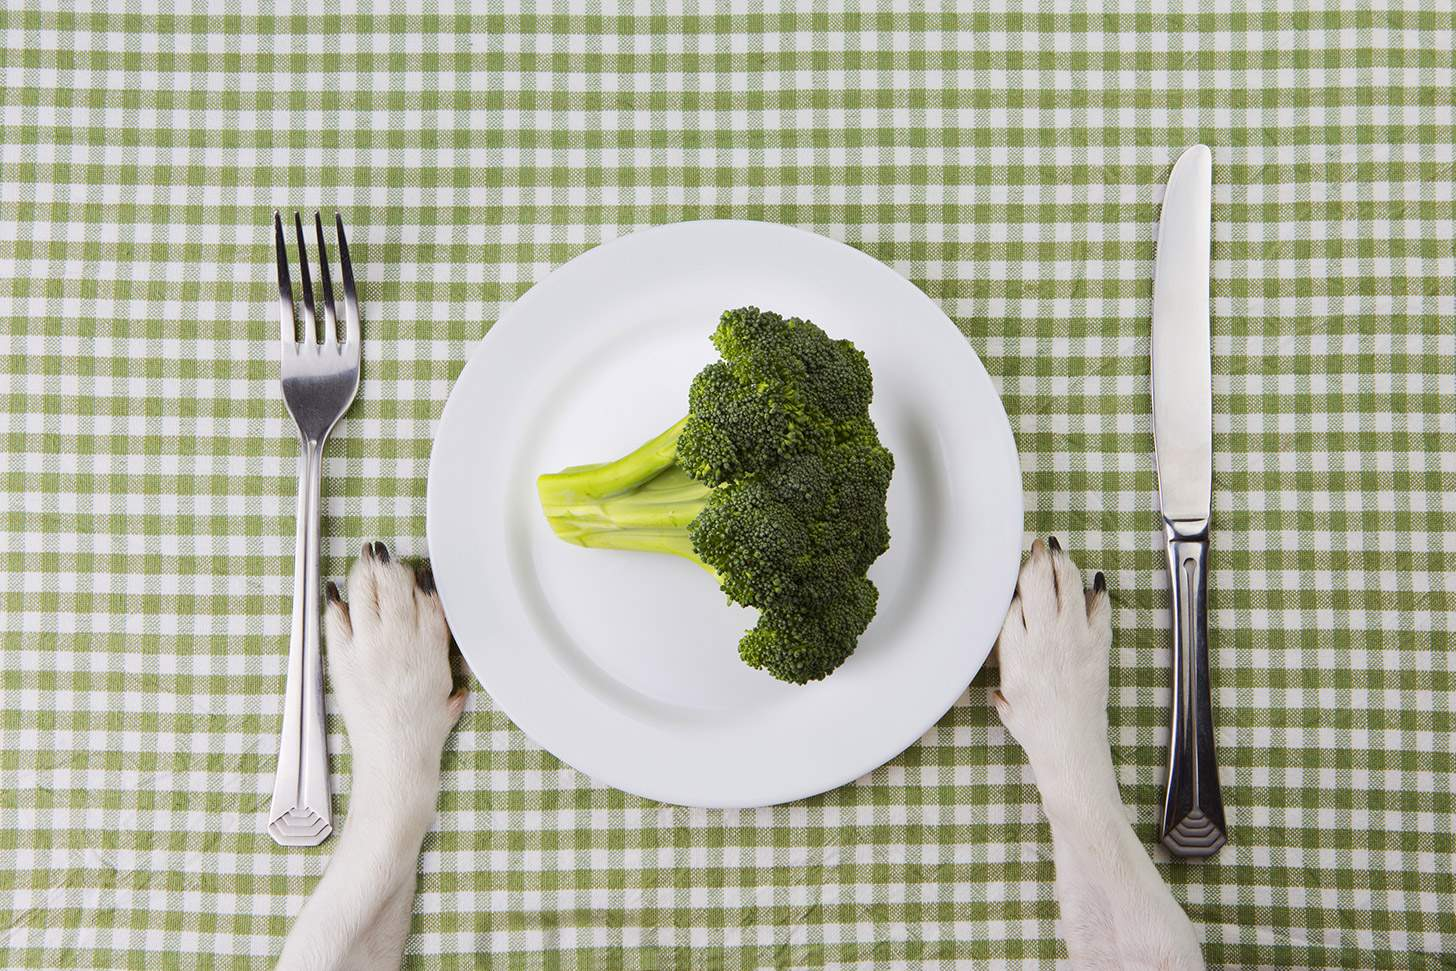 mag hond broccoli eten